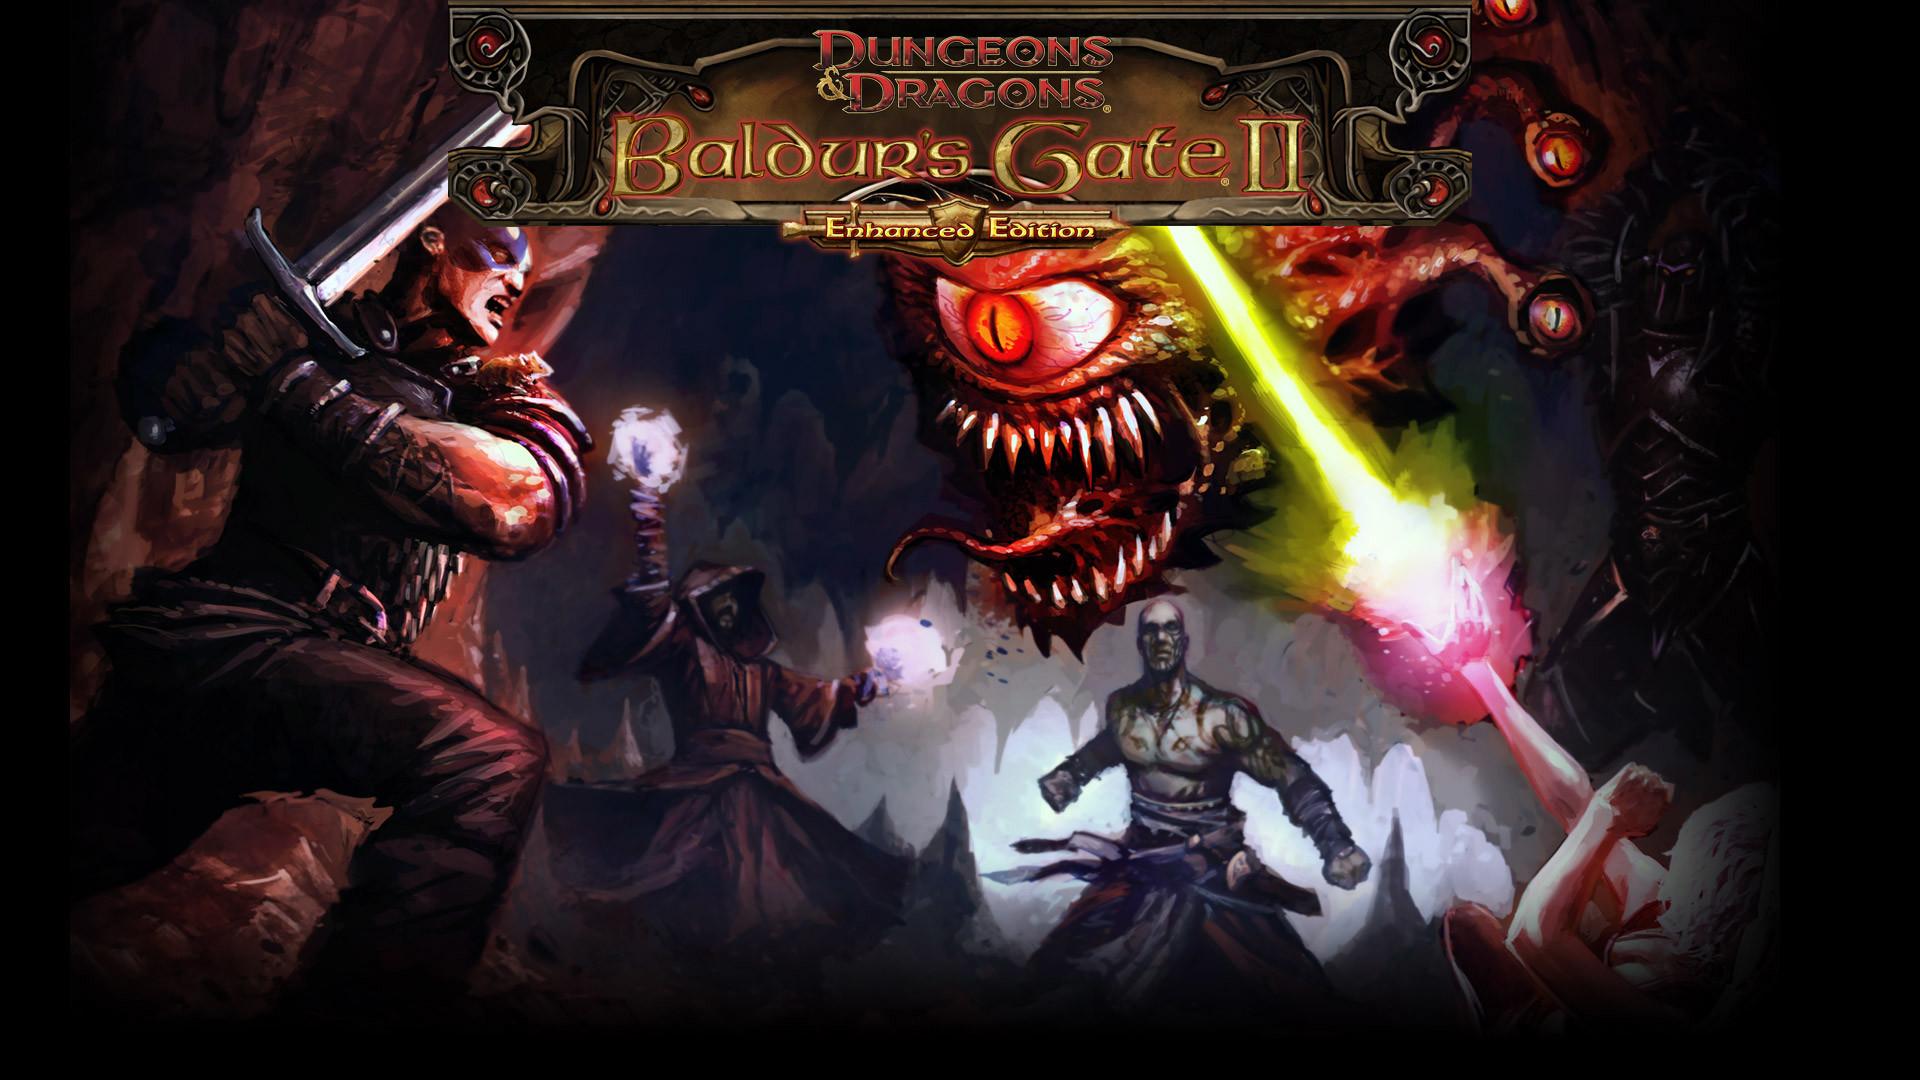 Baldur's Gate II: Shadows of Amn (game)   Forgotten Realms Wiki   FANDOM  powered by Wikia